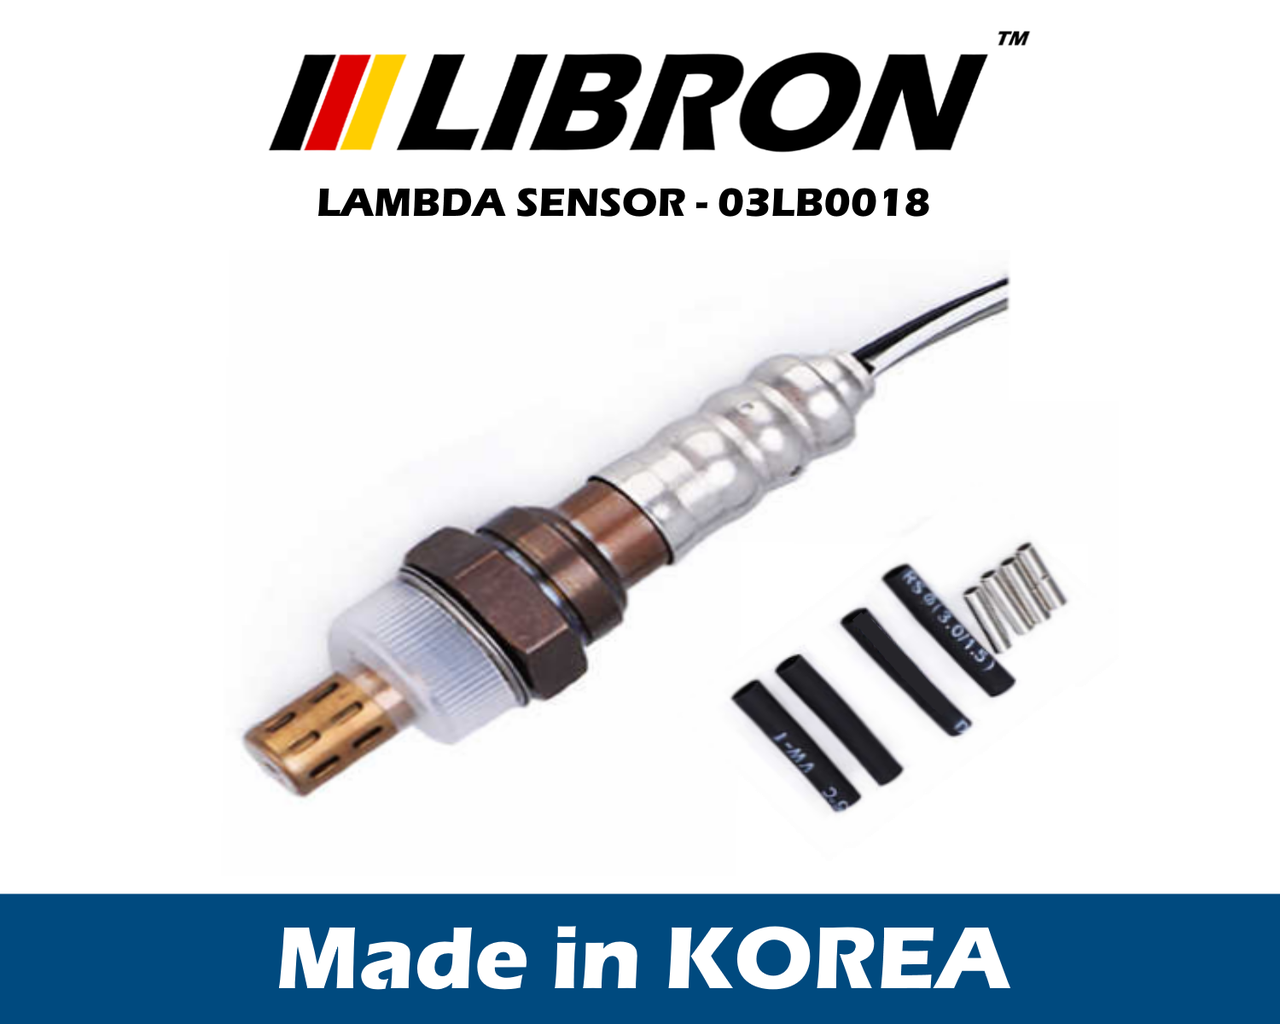 Лямбда зонд Libron 03LB0018 - Ford FIESTA VI Van